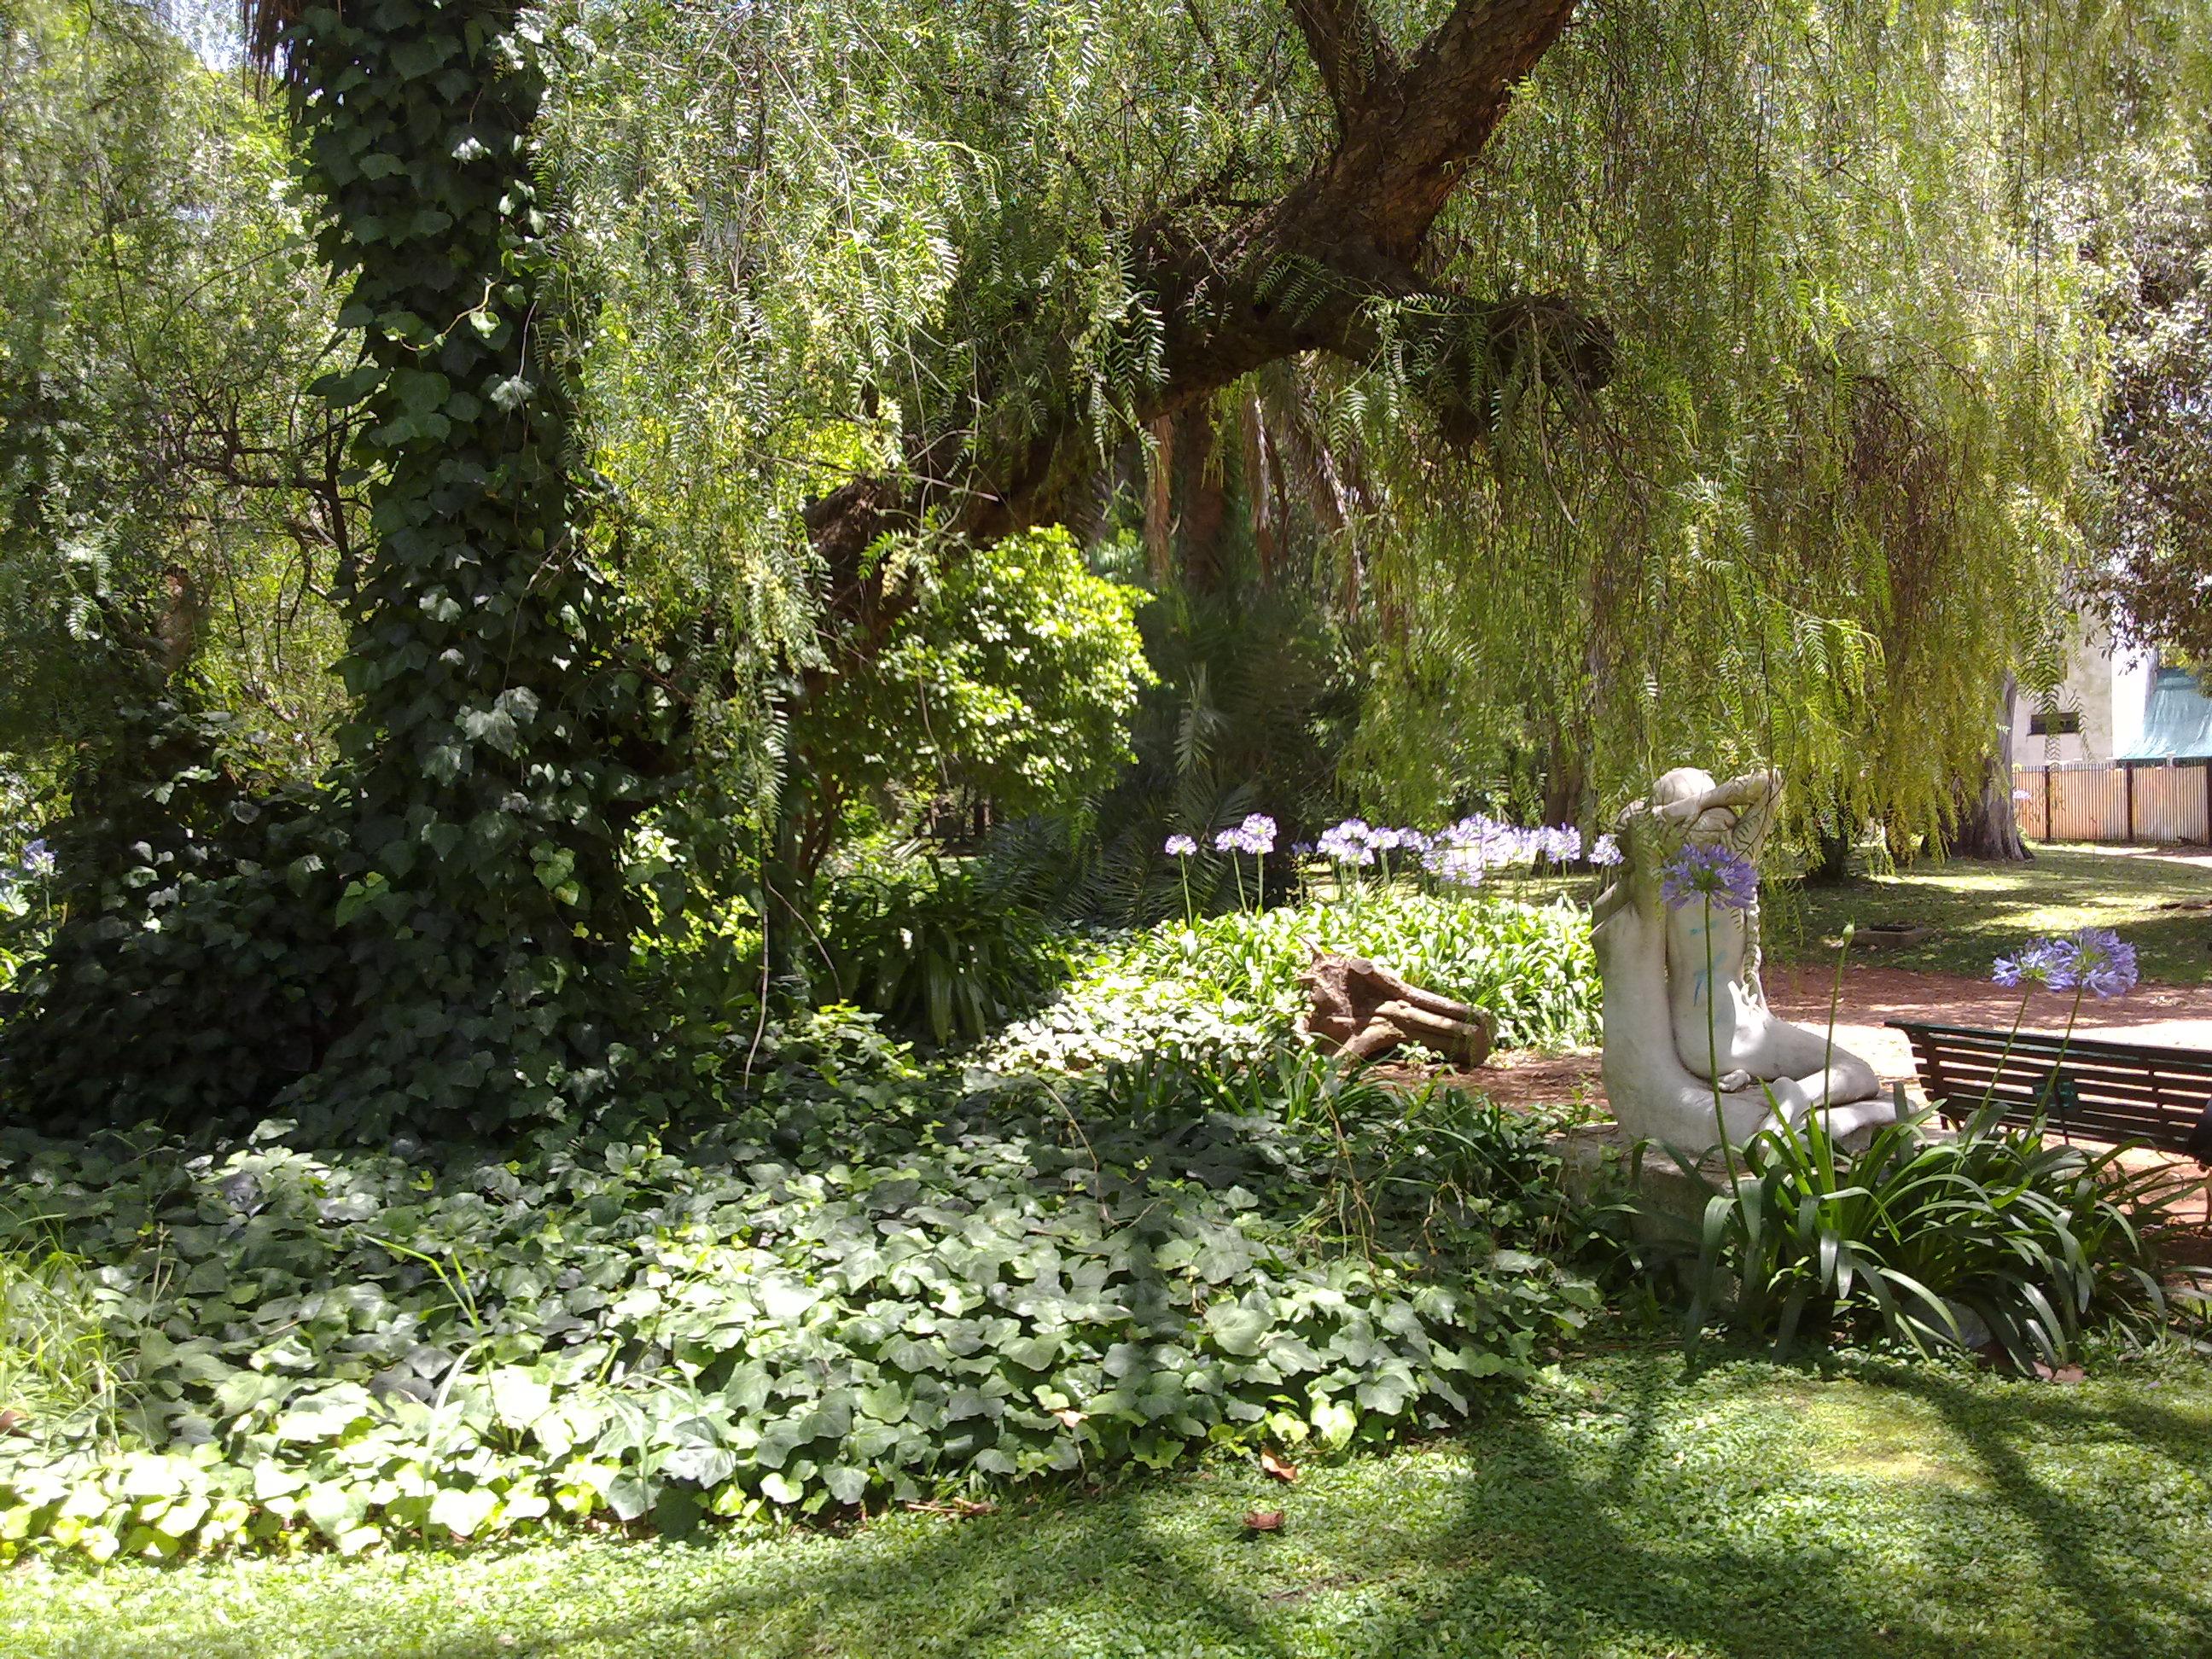 botanische freuden entdeckerei. Black Bedroom Furniture Sets. Home Design Ideas